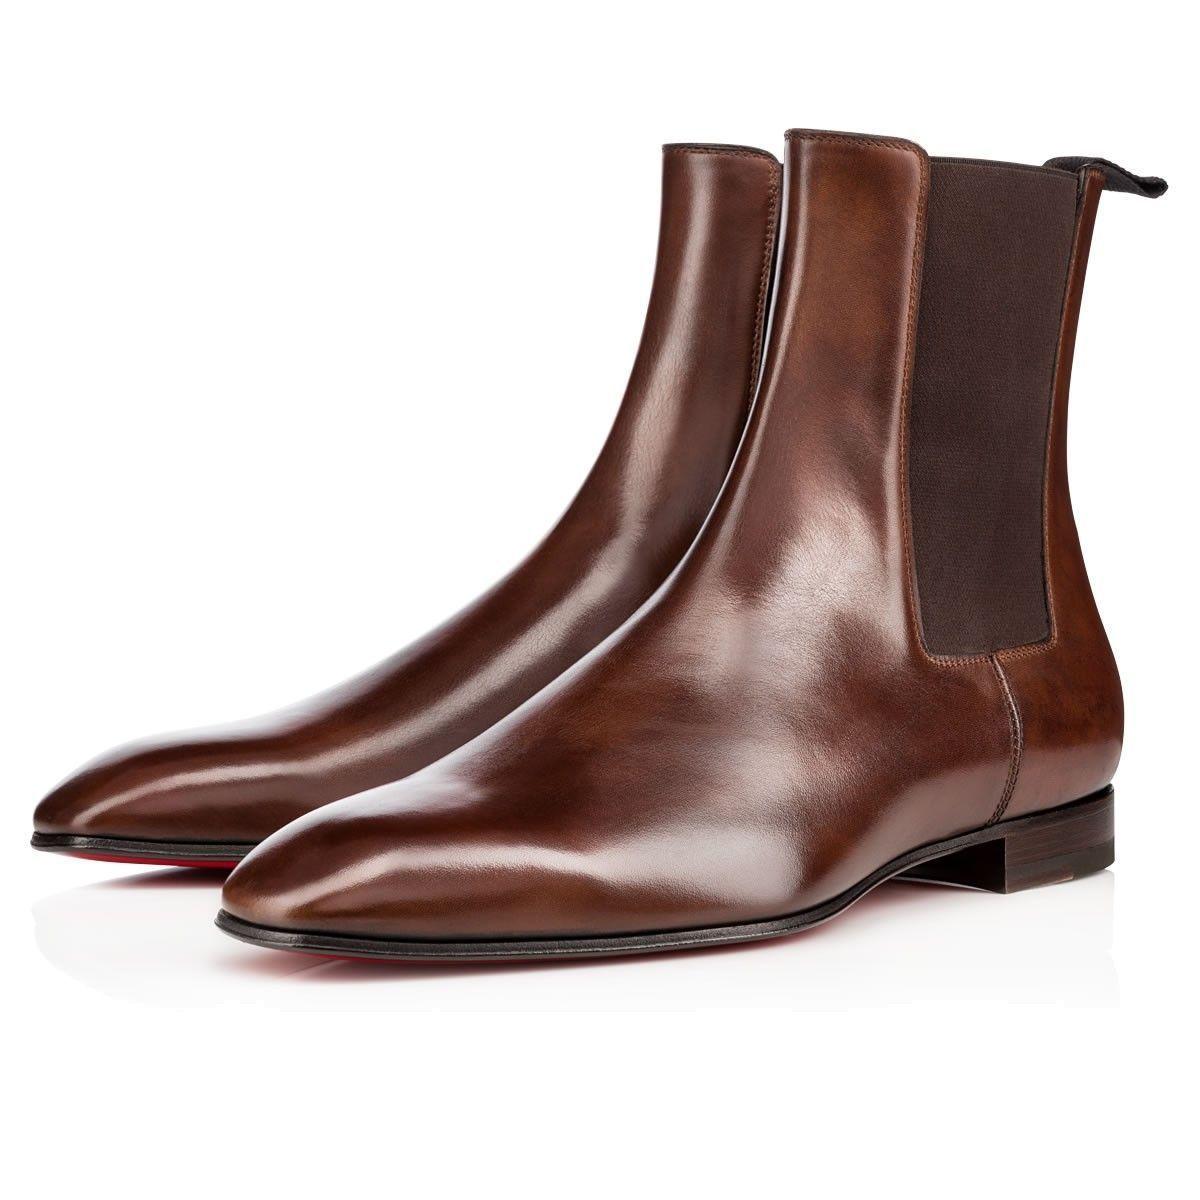 dffc04407d9e7a Men Shoes - Roadie Calf - Christian Louboutin  christianlouboutinflats Mens  Smart Boots